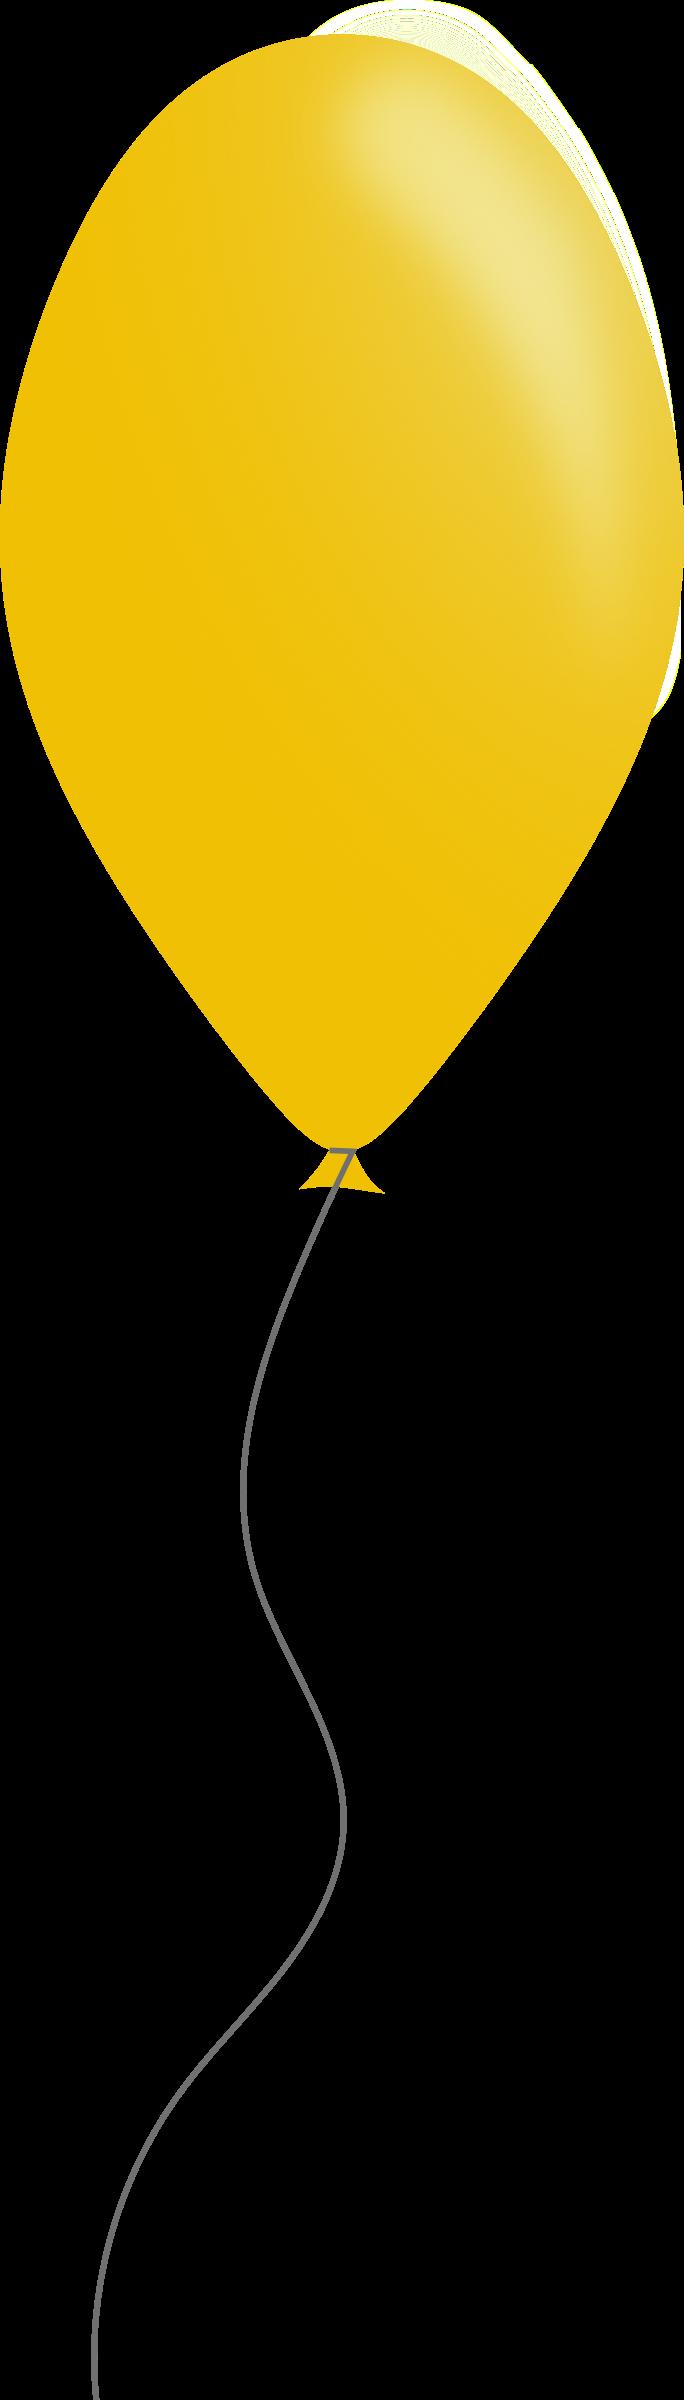 clipart yellow balloons - photo #33